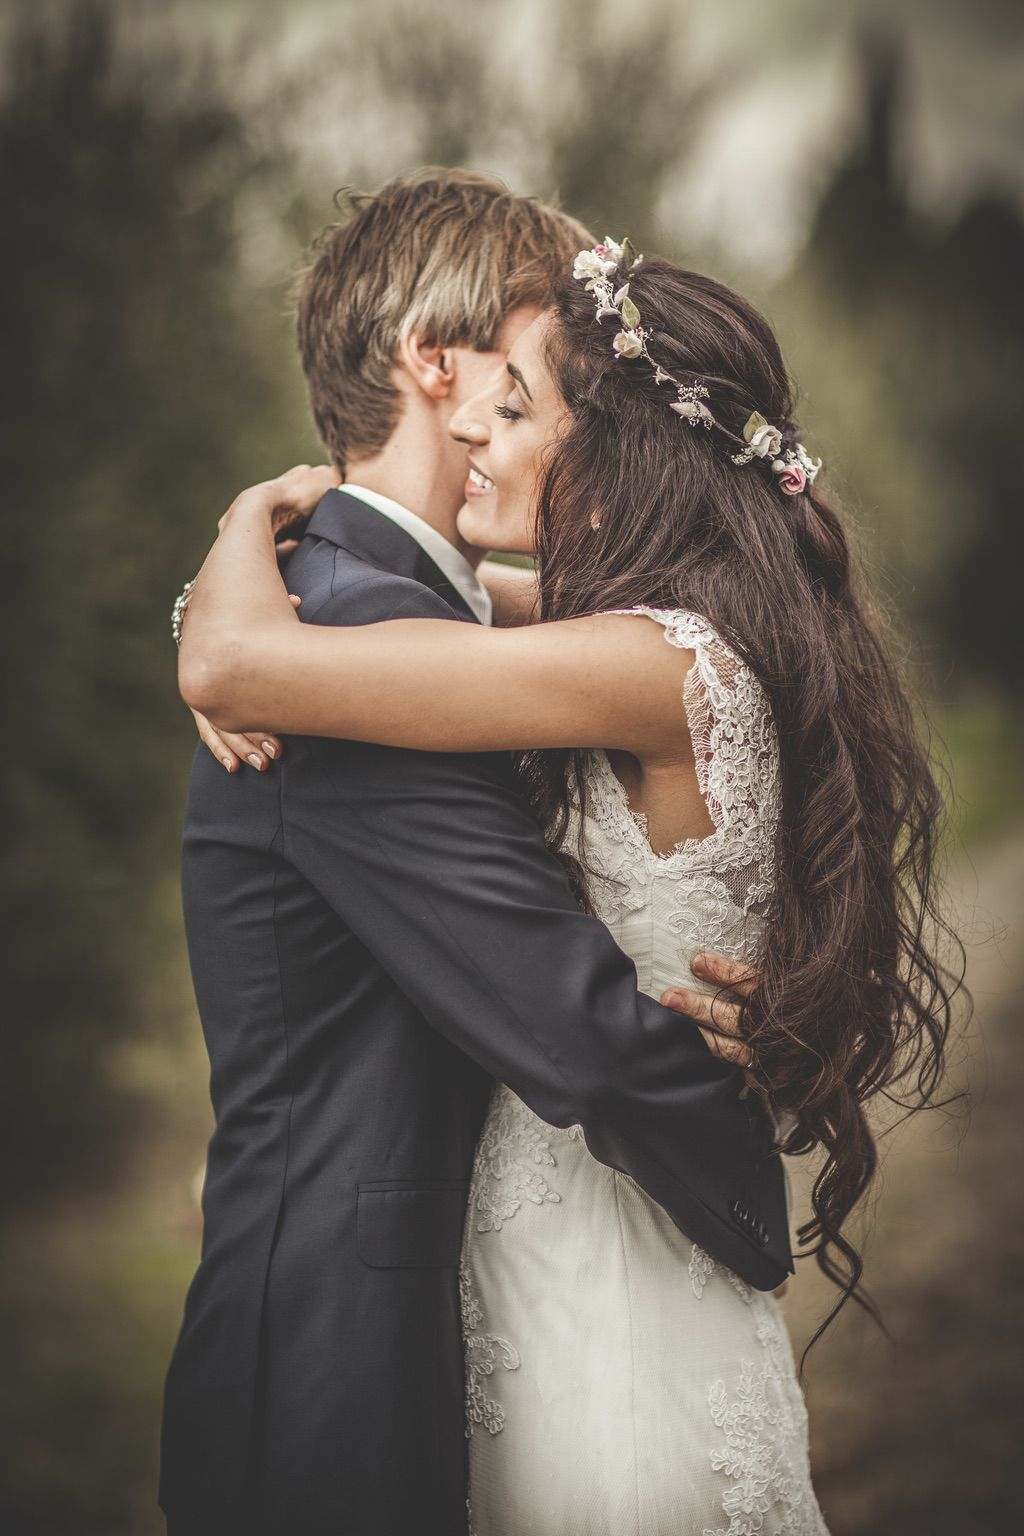 bride-groom-fusion-Pakistani-wedding-villa-catignano-058